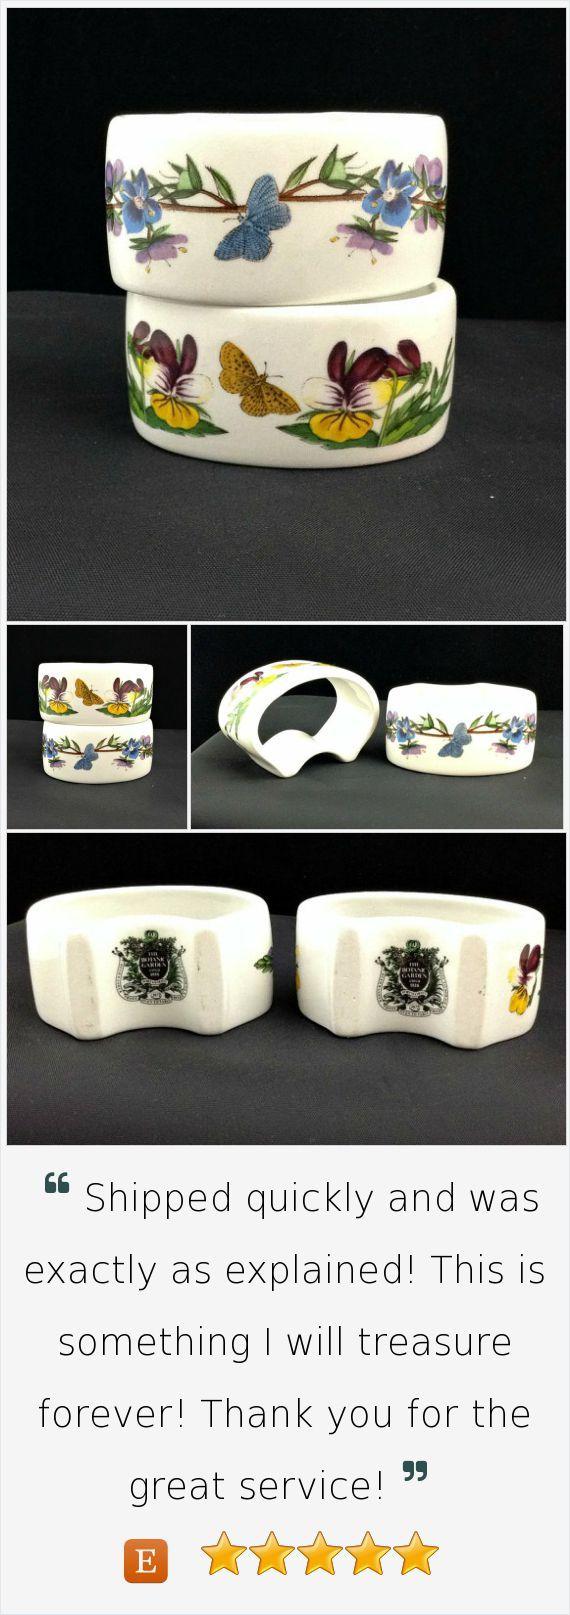 Portmeirion China Botanic Garden Napkin Rings Napkin Holders Pair - Speedwell, Heartsease #vintage